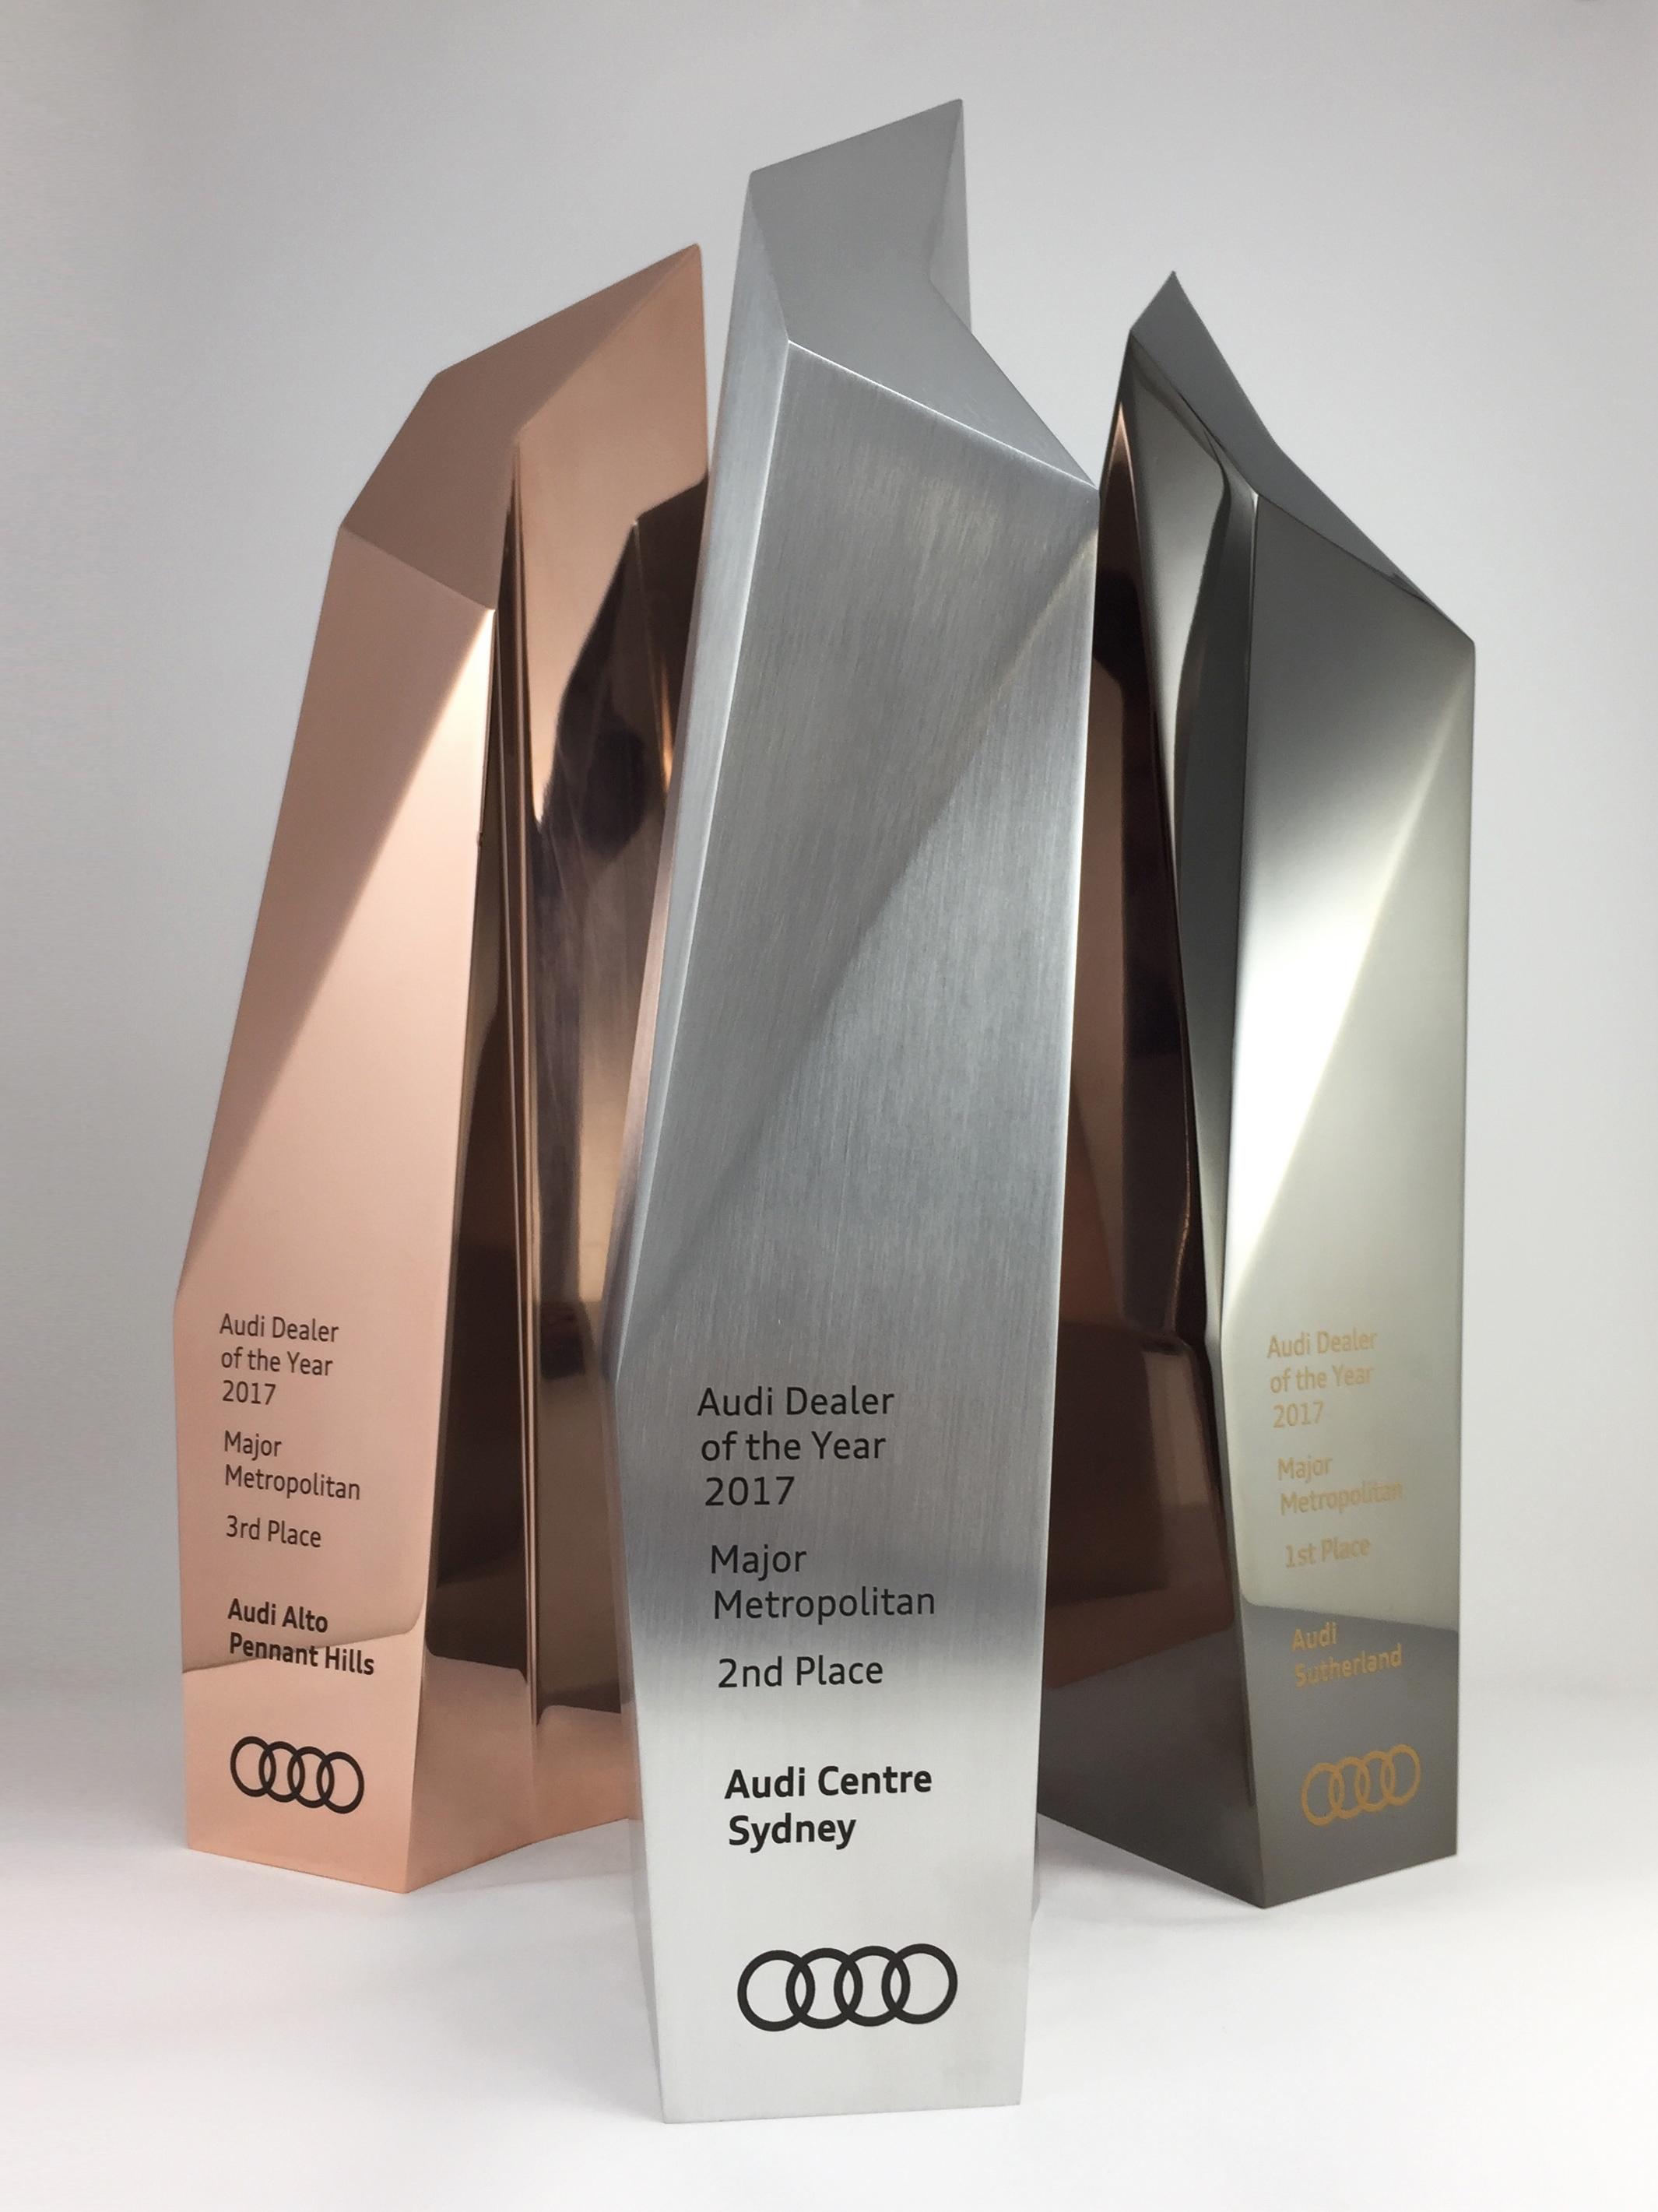 audi-metal-art-sculpture-award-trophy-09.jpg